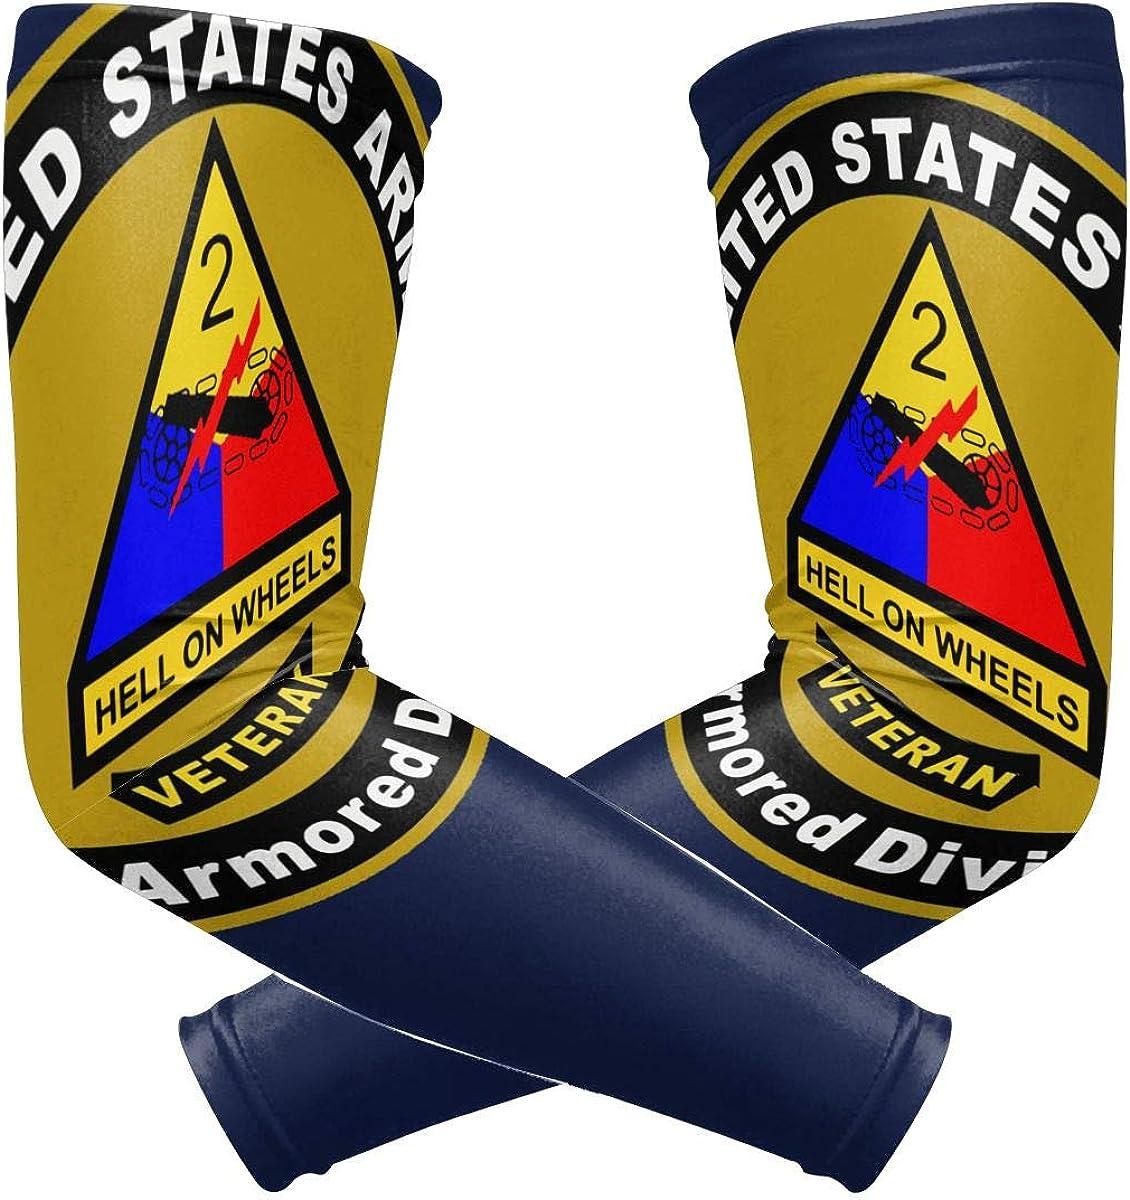 United States Army Veteran...